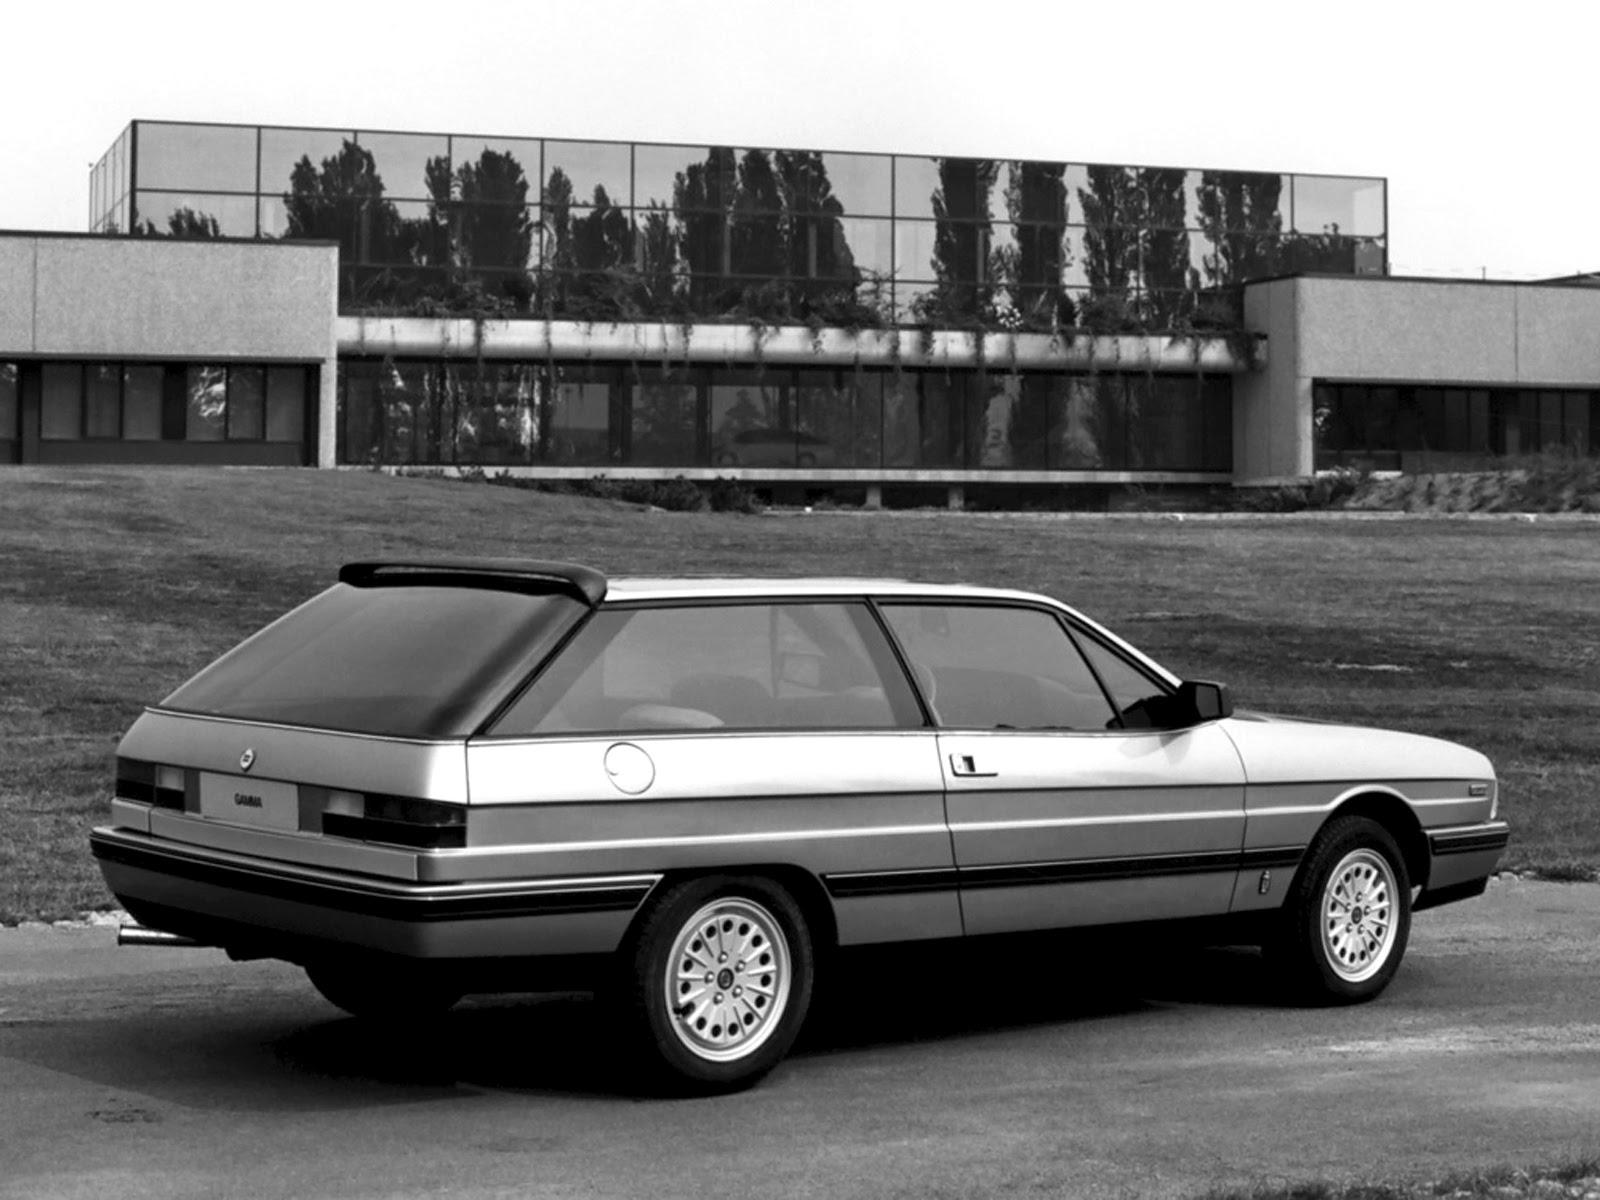 stormwheels 1982 paris autoshow pininfarina lancia gamma olgiata prototipo an estate. Black Bedroom Furniture Sets. Home Design Ideas